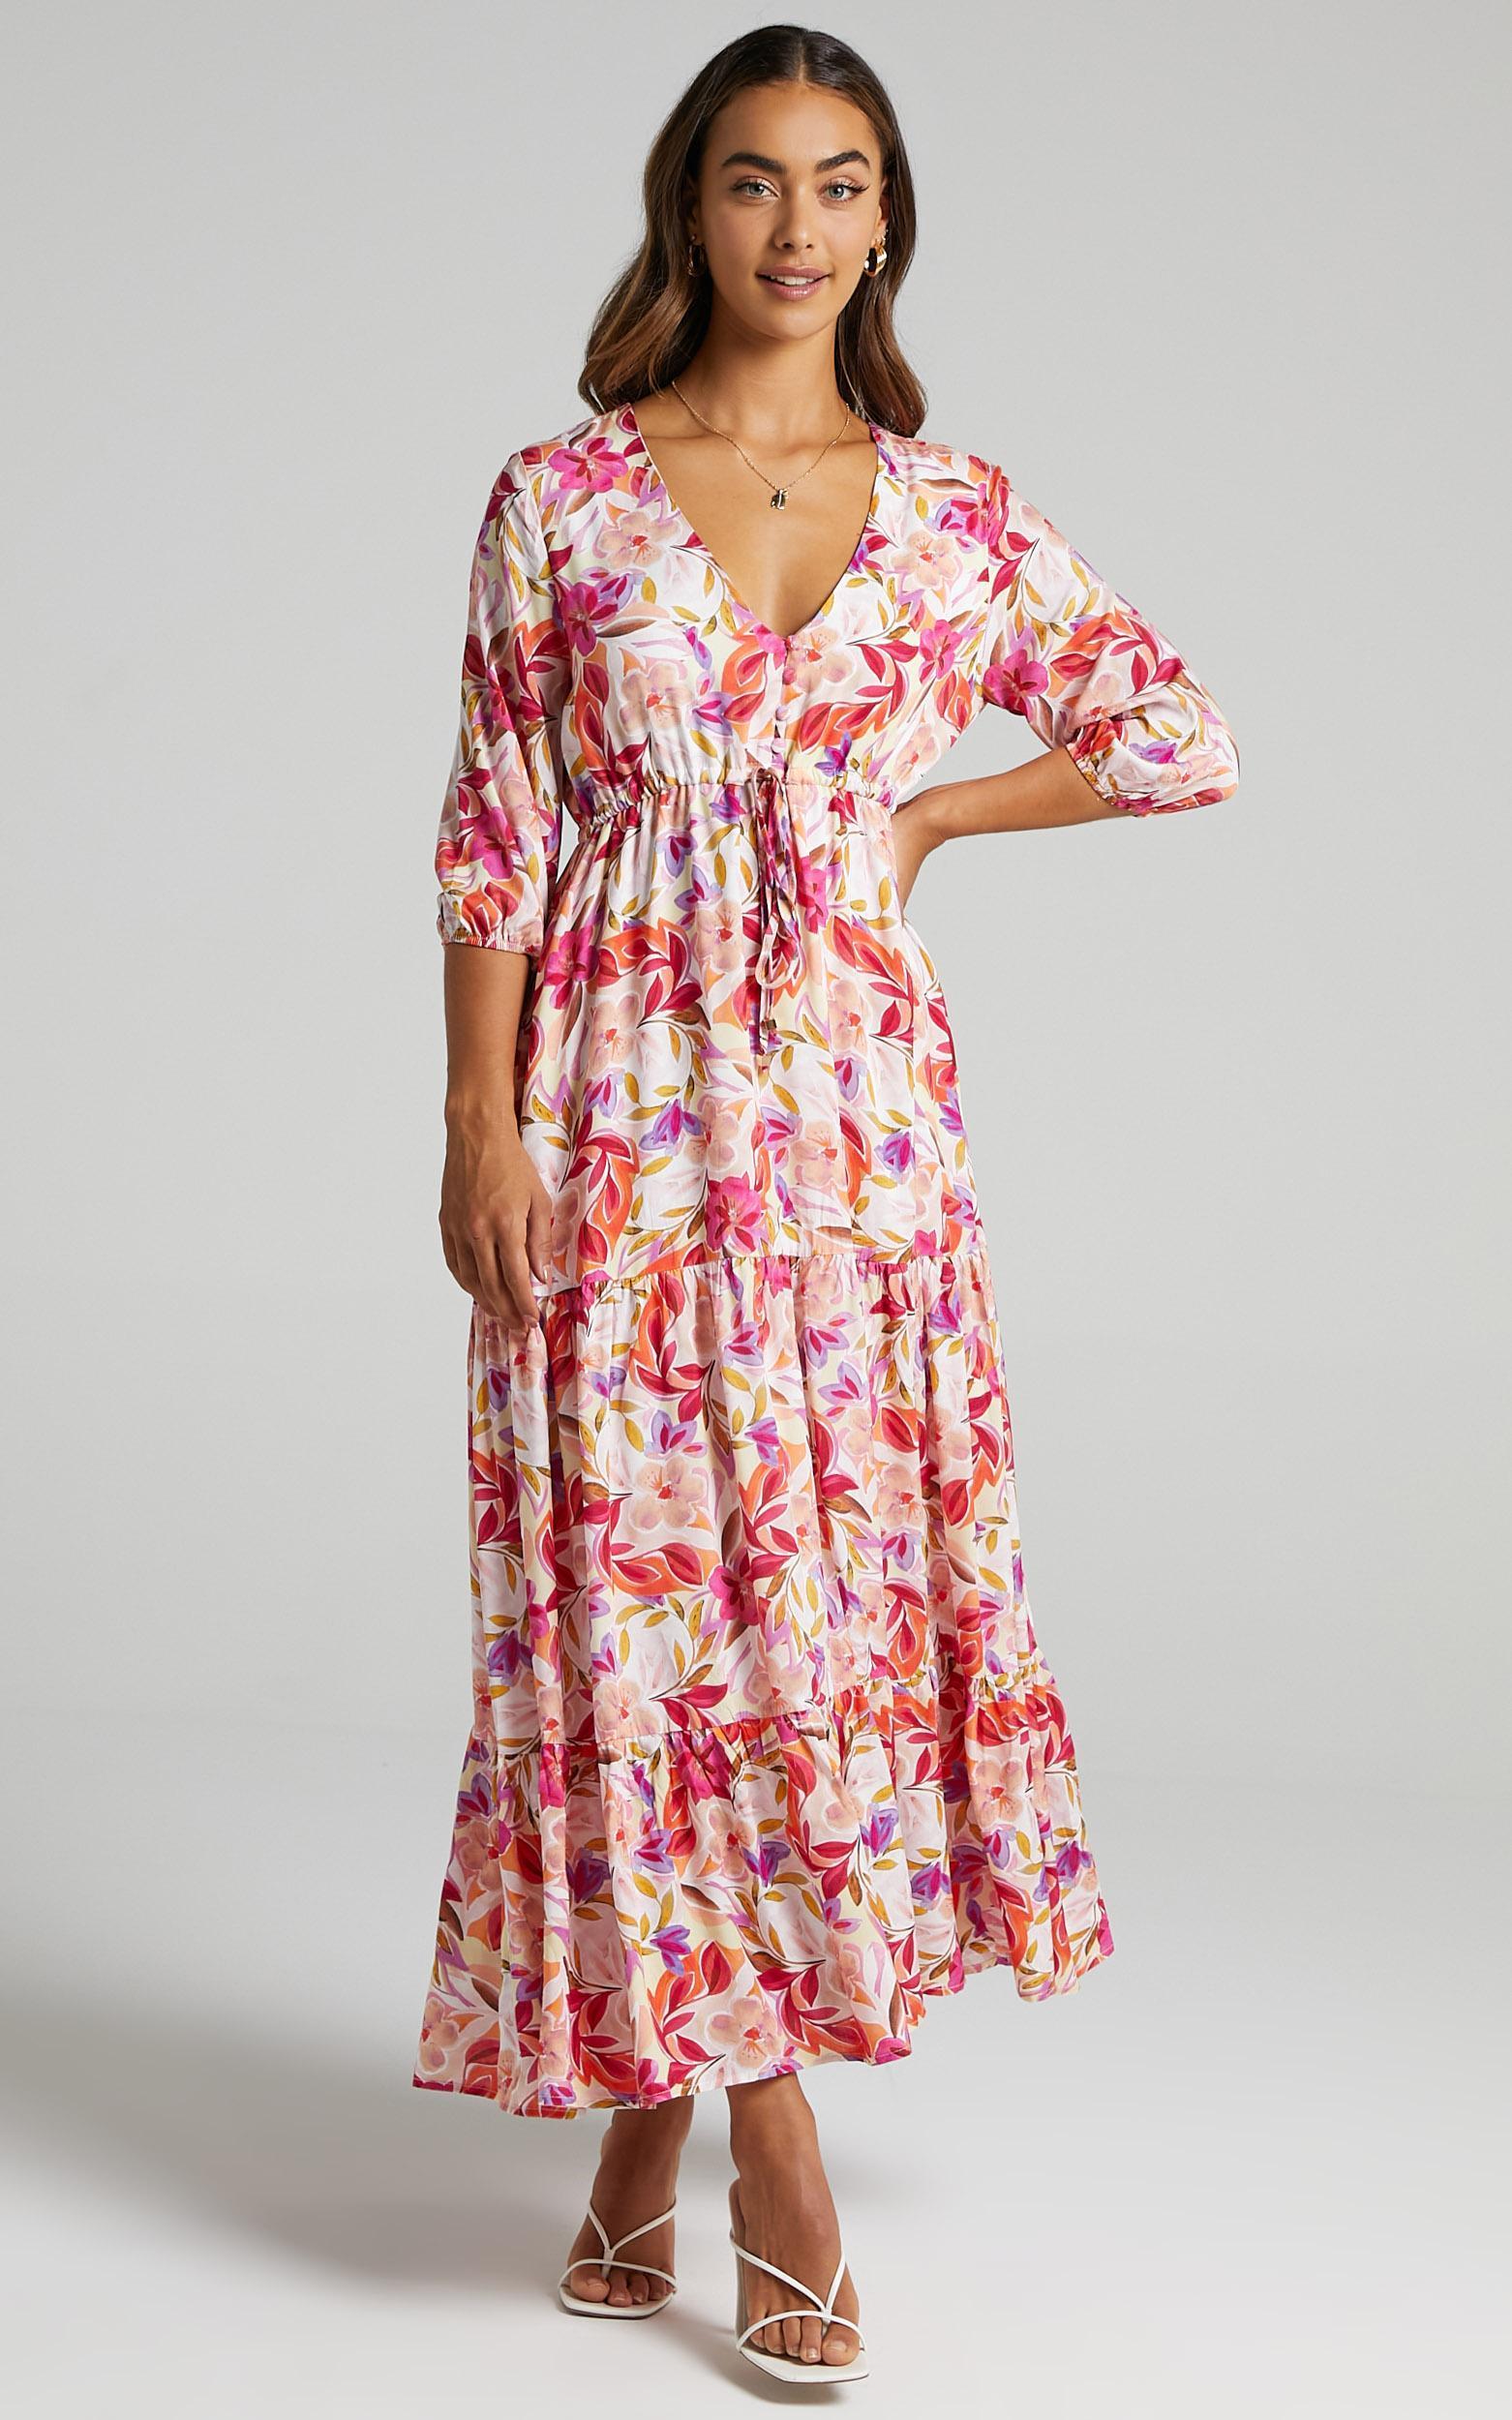 Lilibelle Dress in Eventful Bloom - 06, PNK1, hi-res image number null